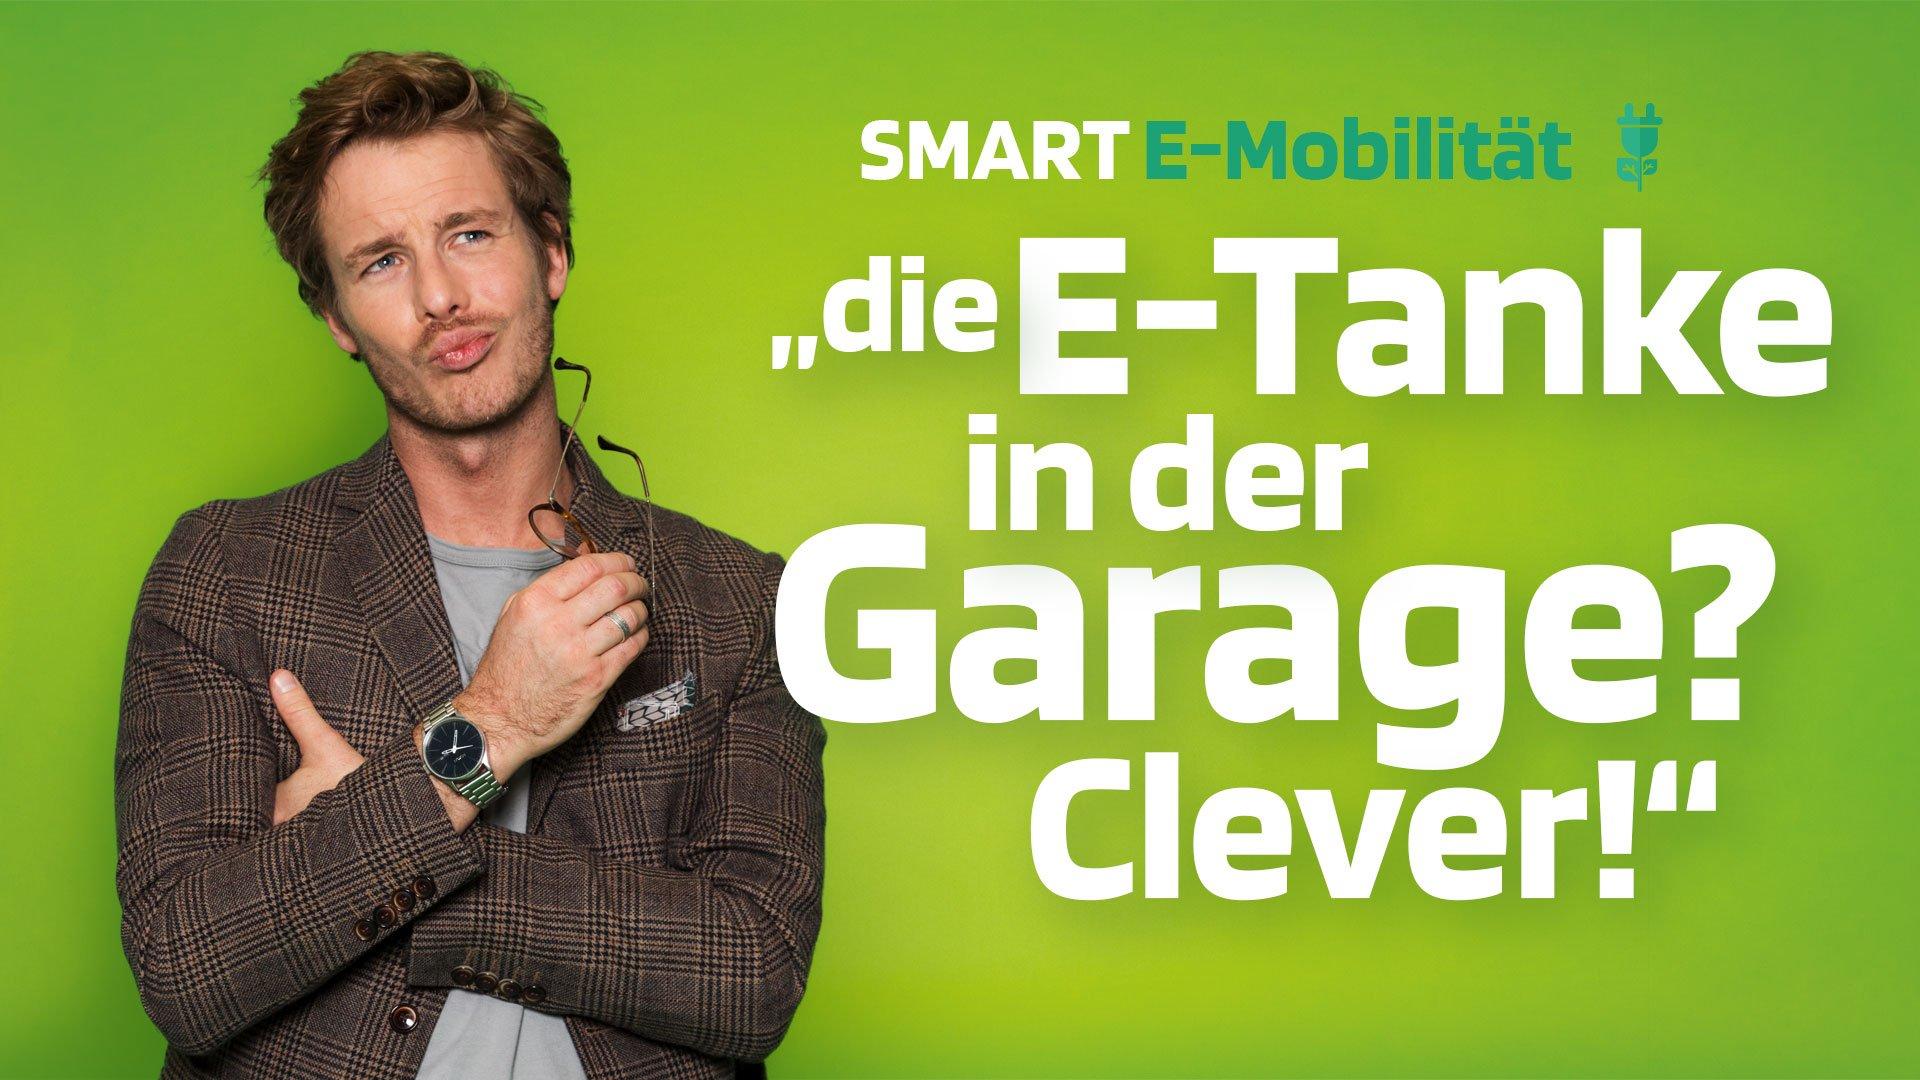 Paul sagt zu SMART E-Mobilität: Mein Elektroauto zuhause laden? - Clever!